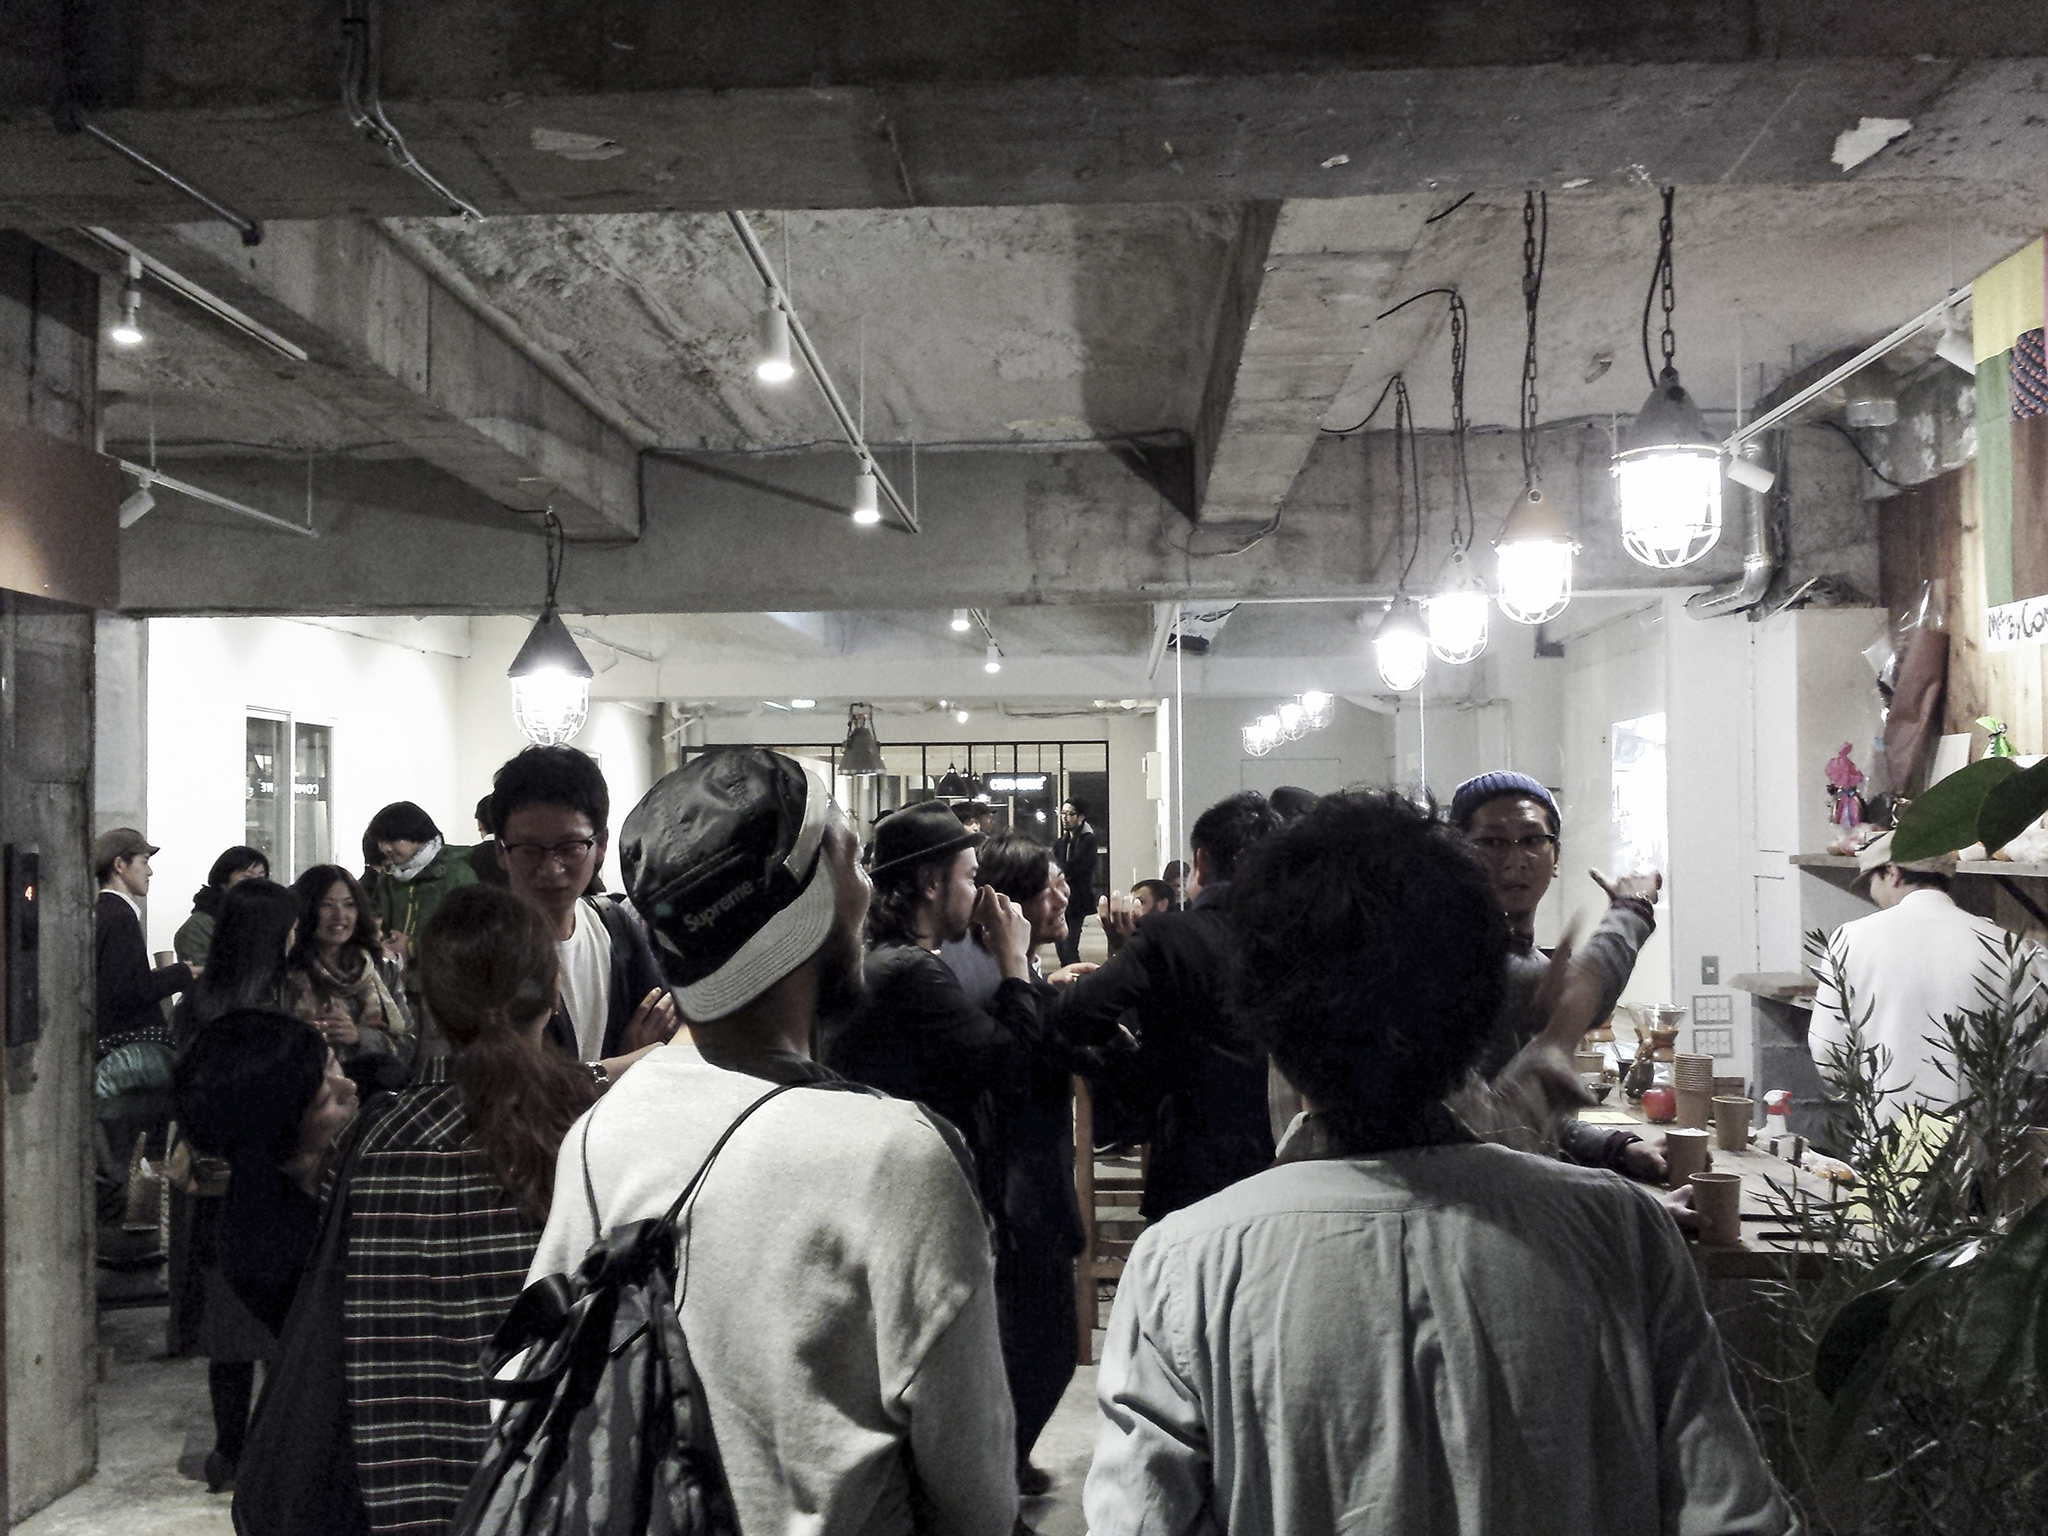 20141005_meet_reception_party28.jpg